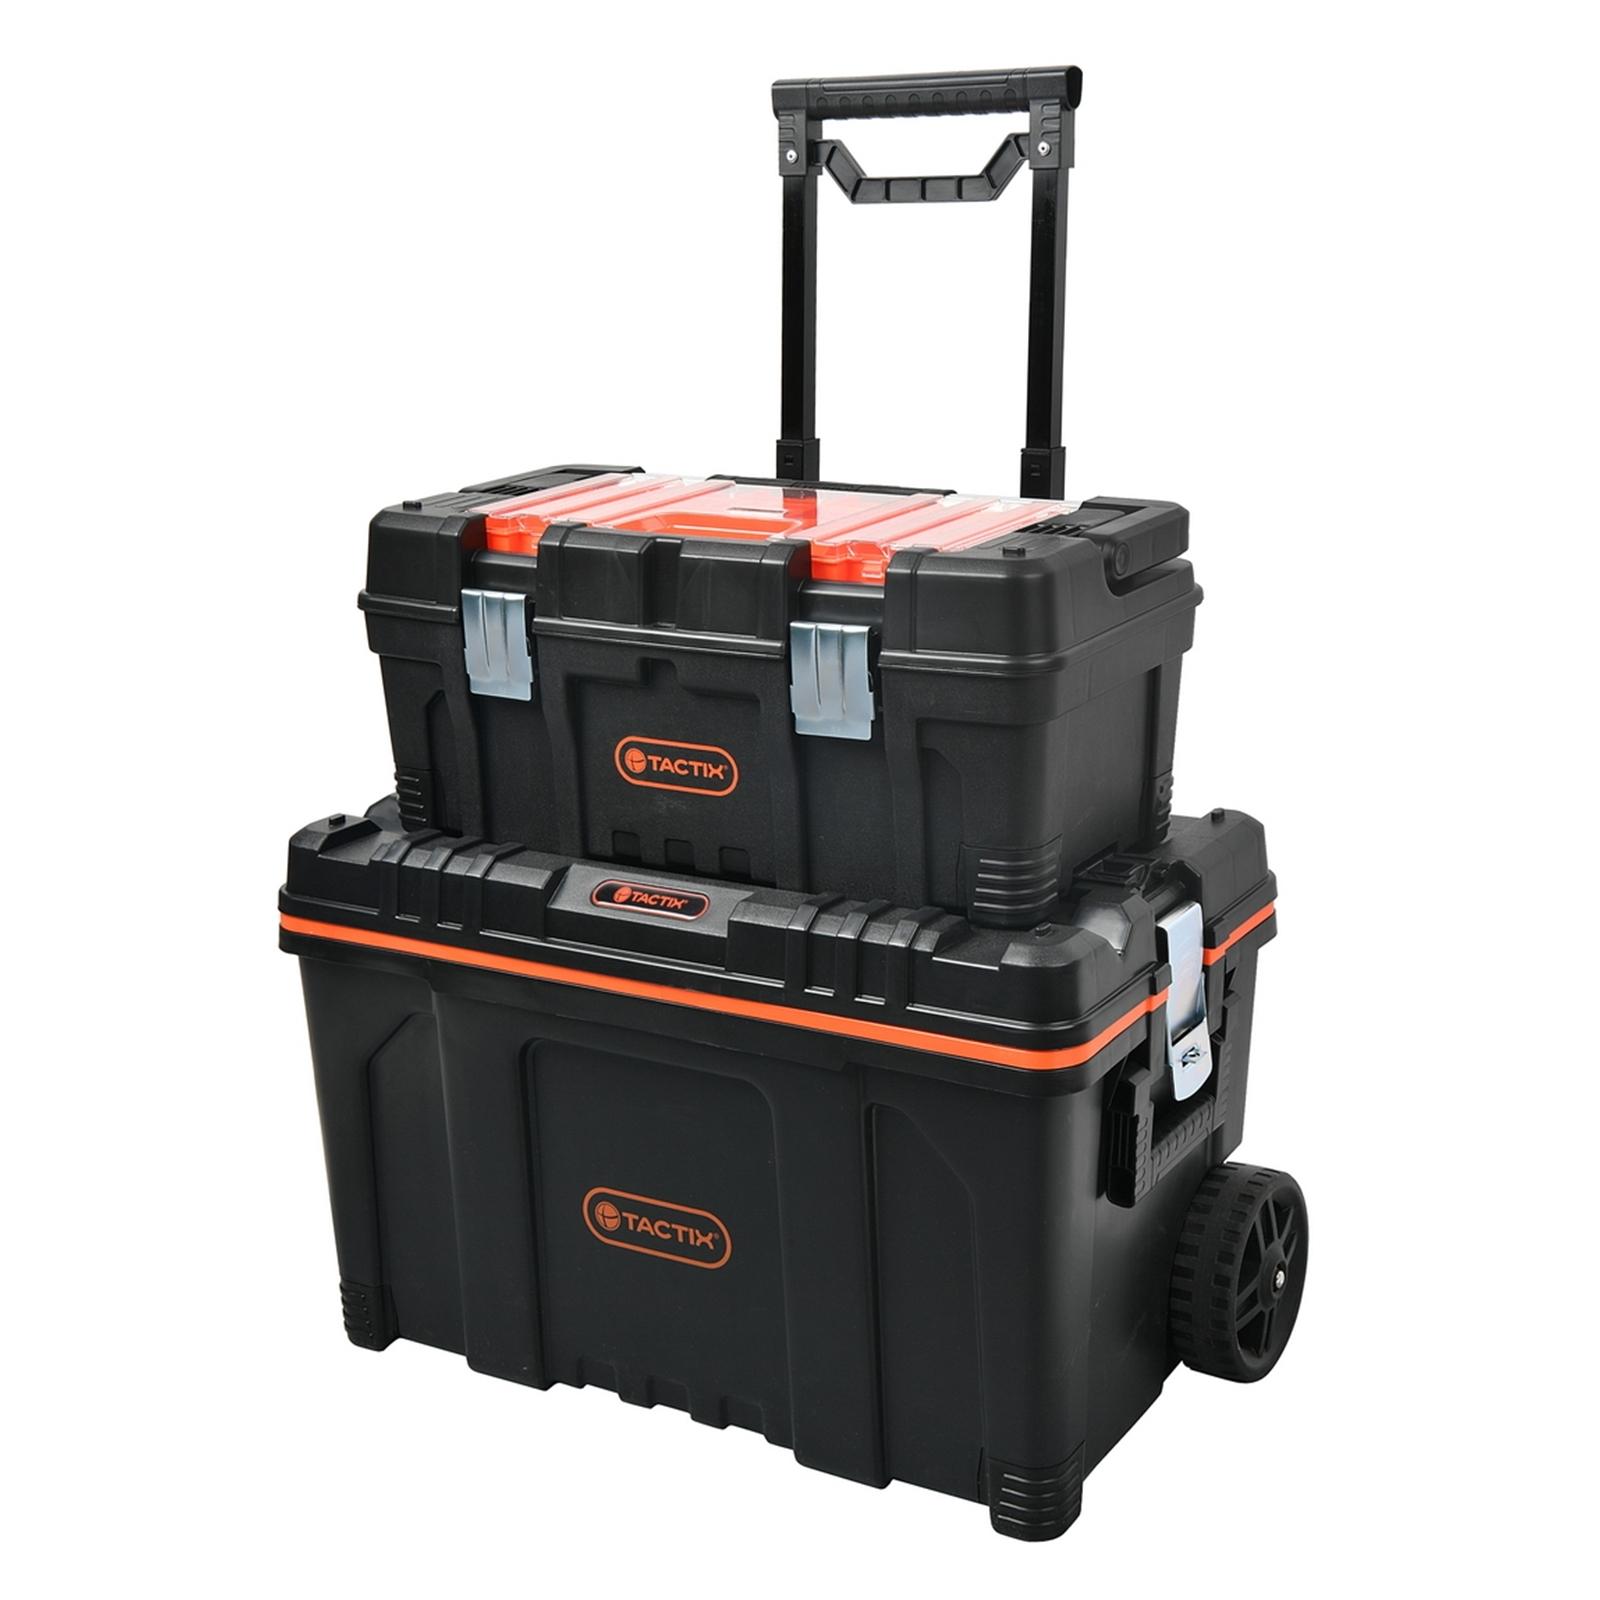 Tactix 2 In 1 Rolling Tool Box Set